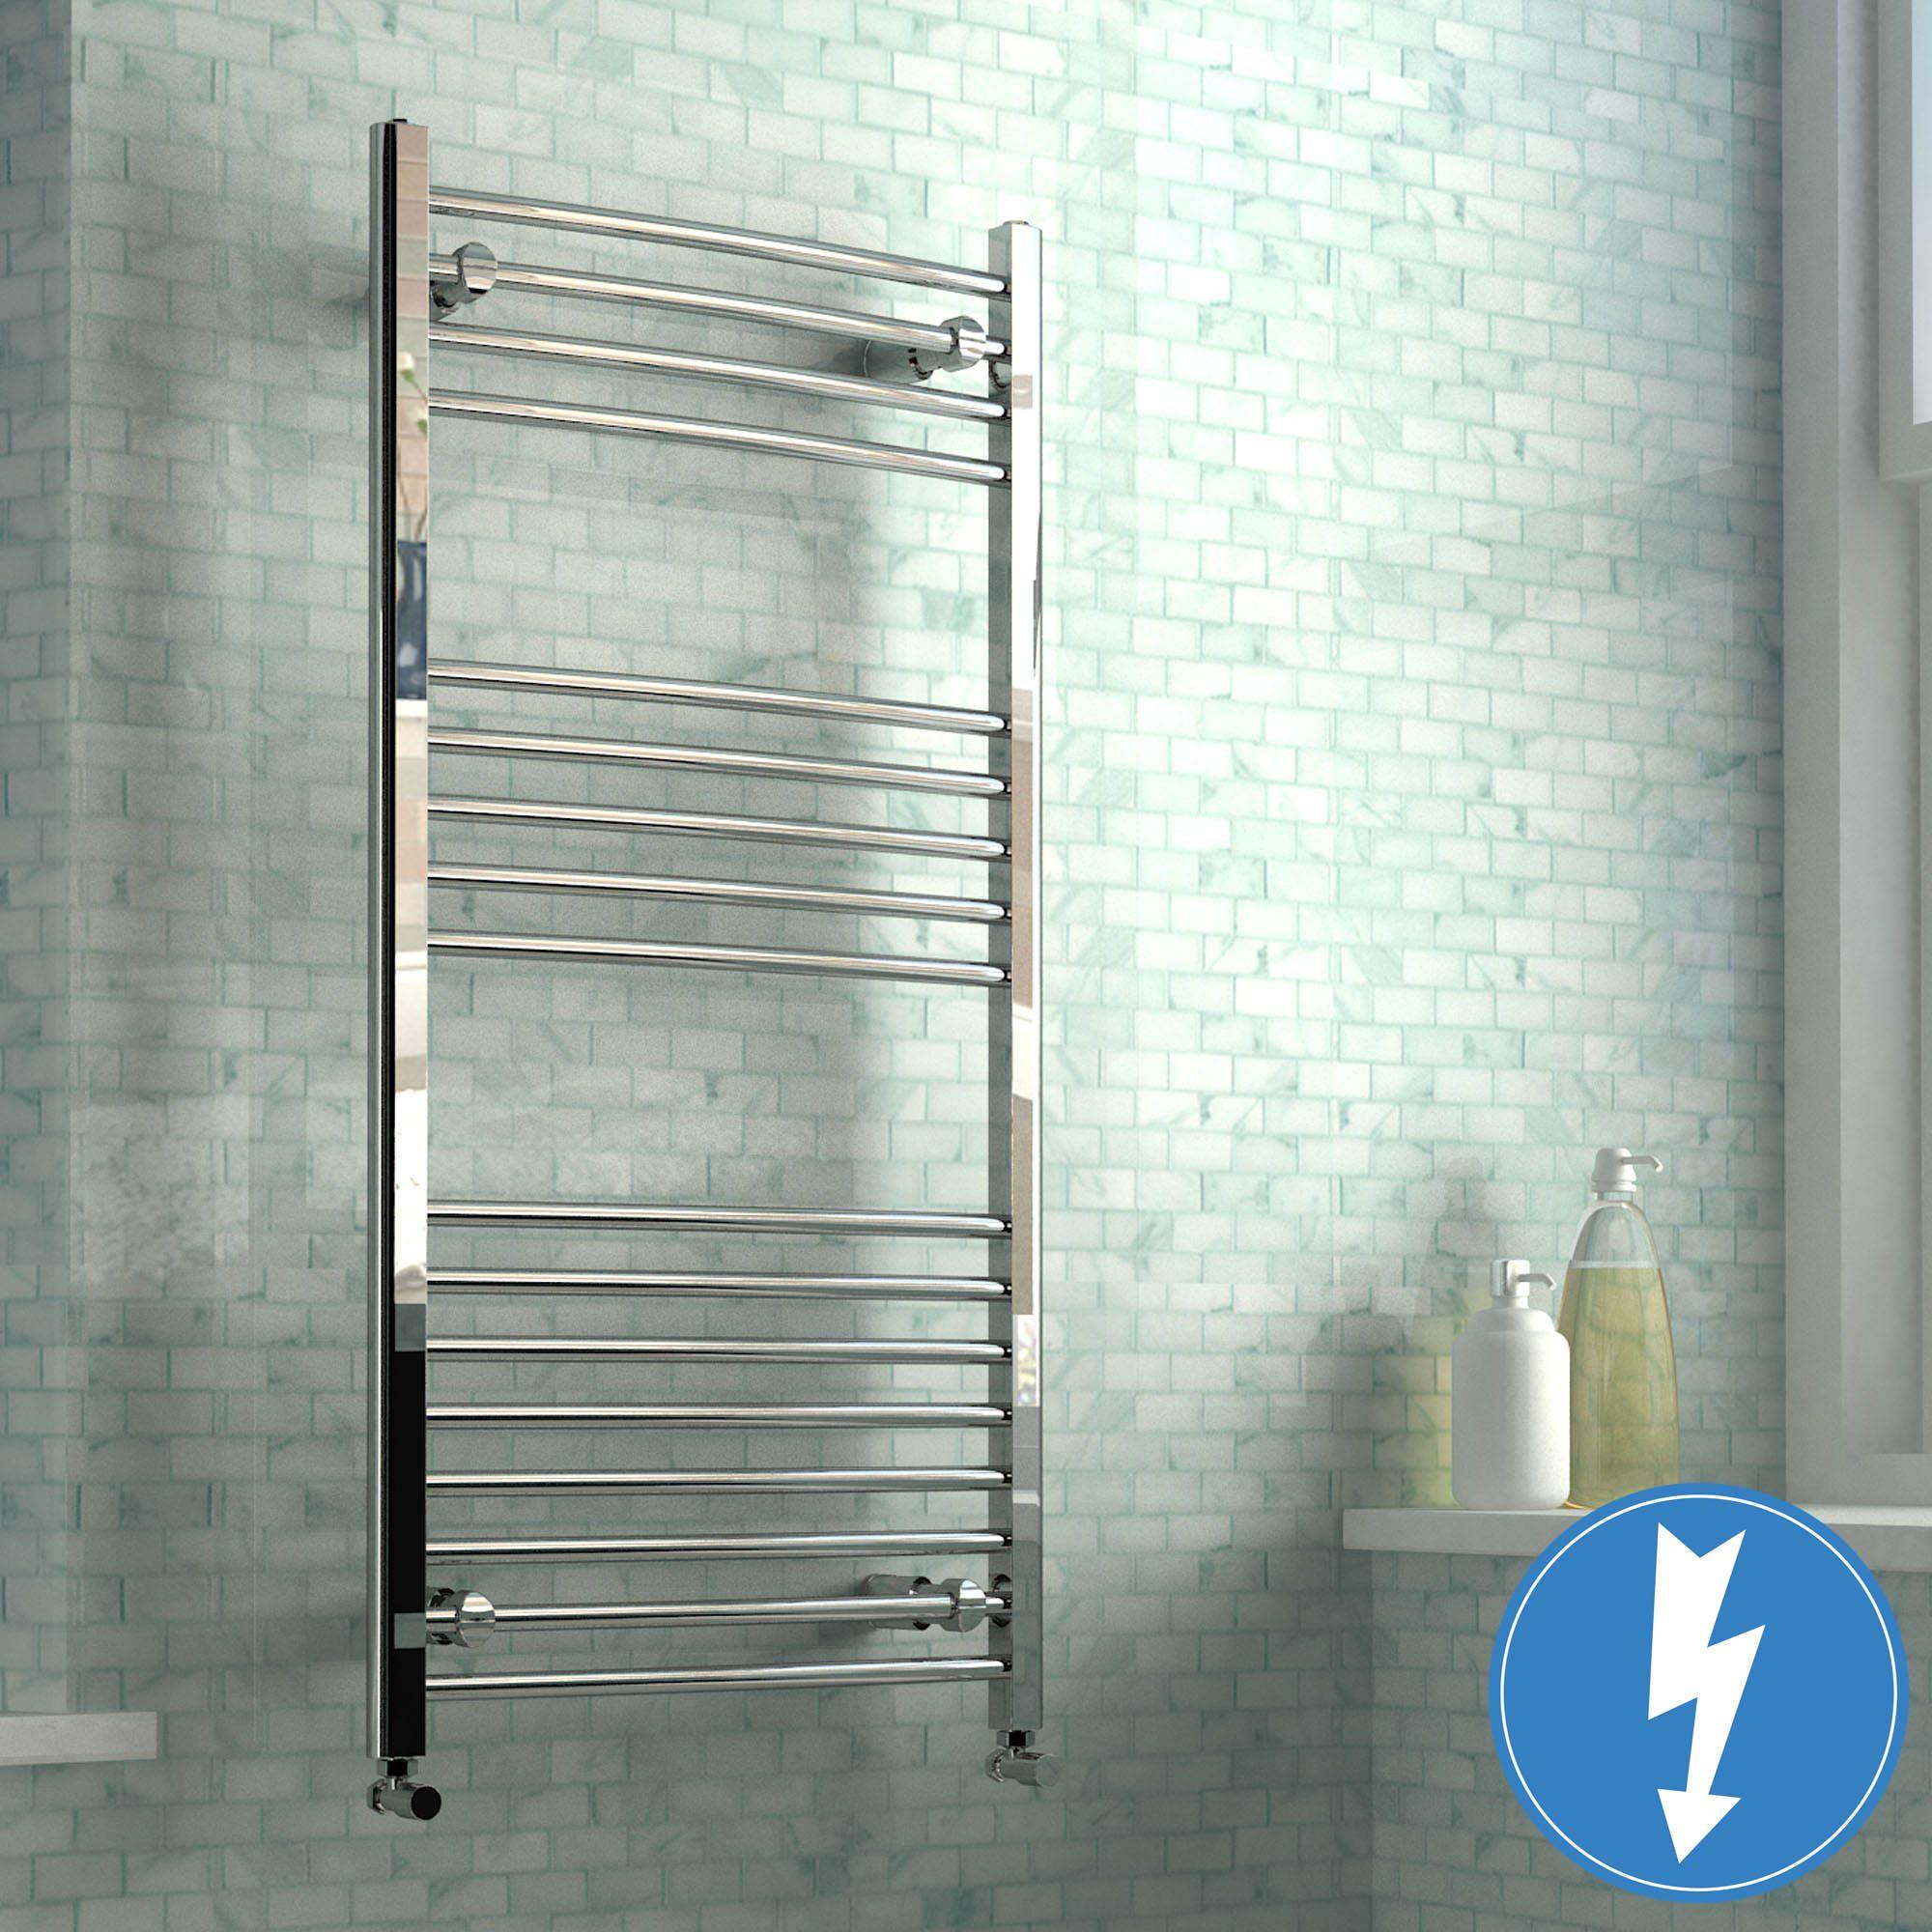 Natasha ladder rail straight modern electric towel radiator in chrome - Ladder Rail Curved Modern Electric Towel Radiator In Chrome 1200mm X 600mm